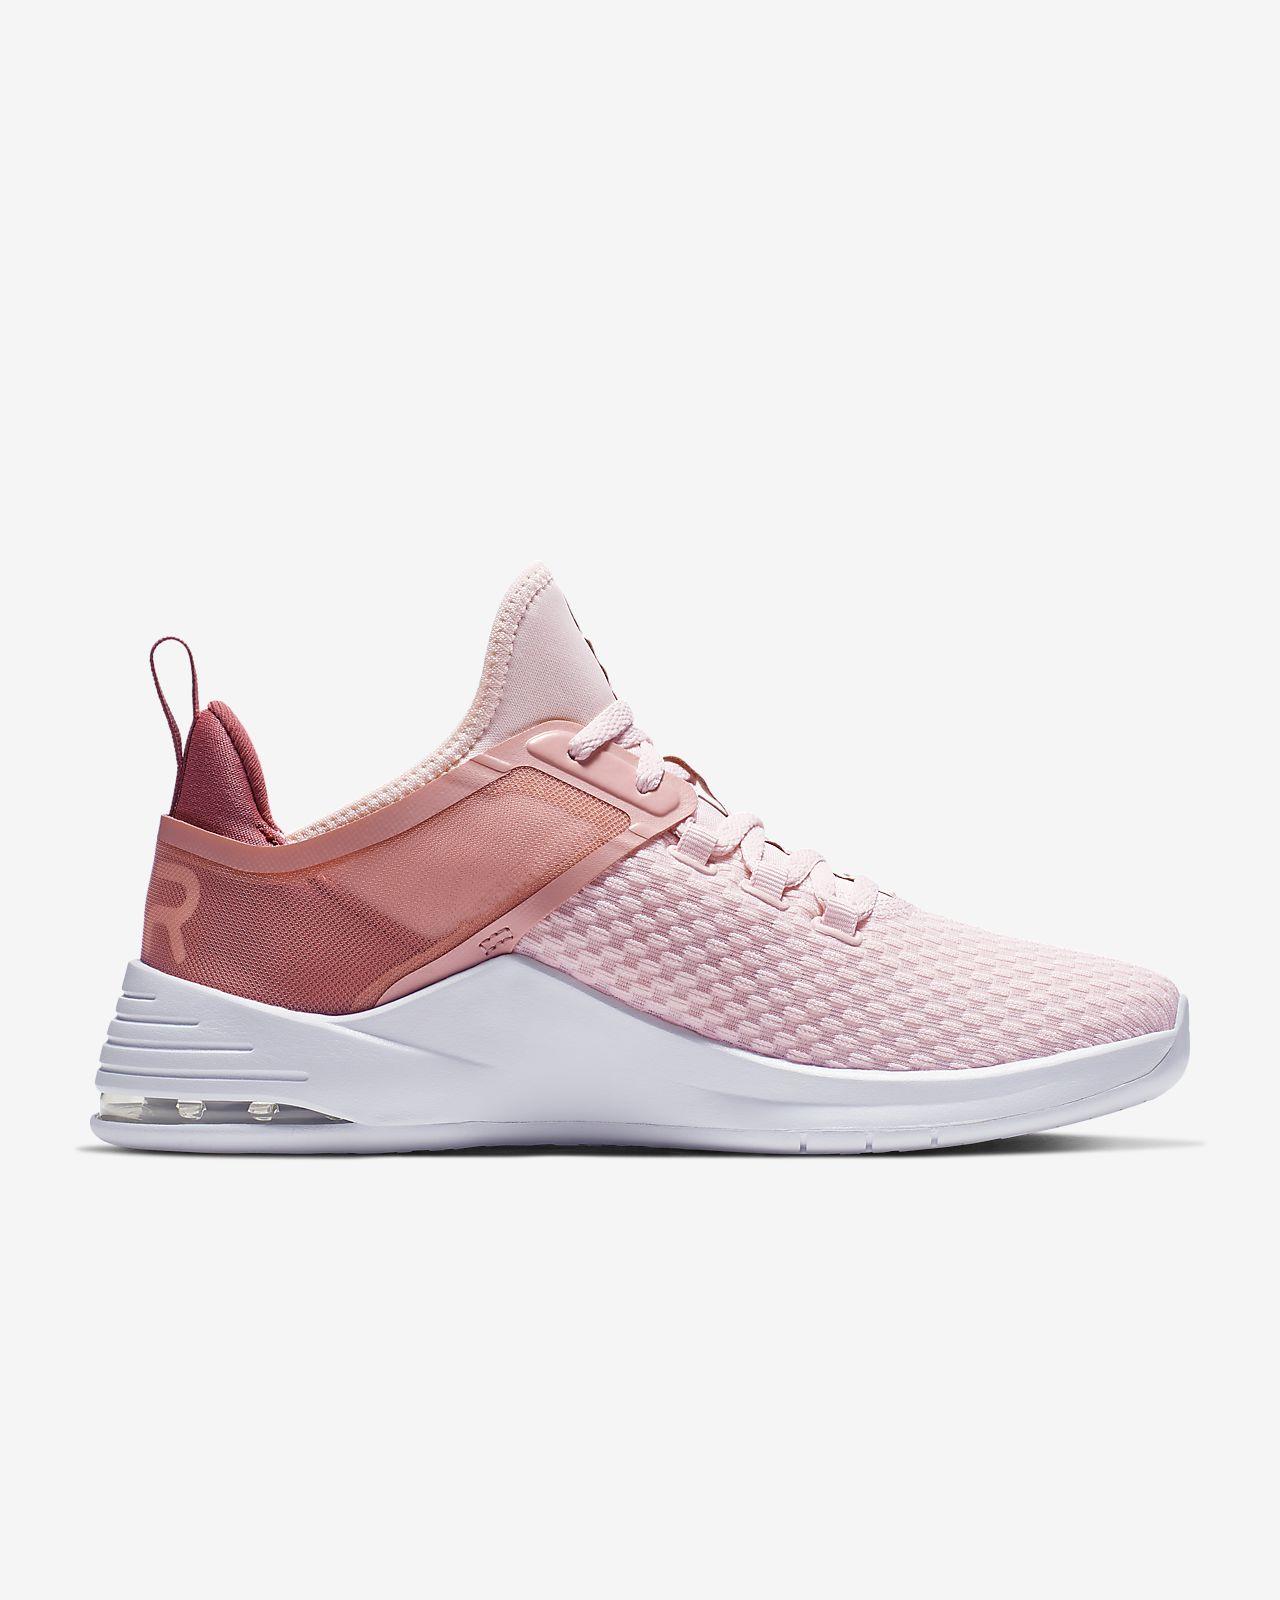 Nike Air Max Thea Se Rose Gold schuetzt unsere